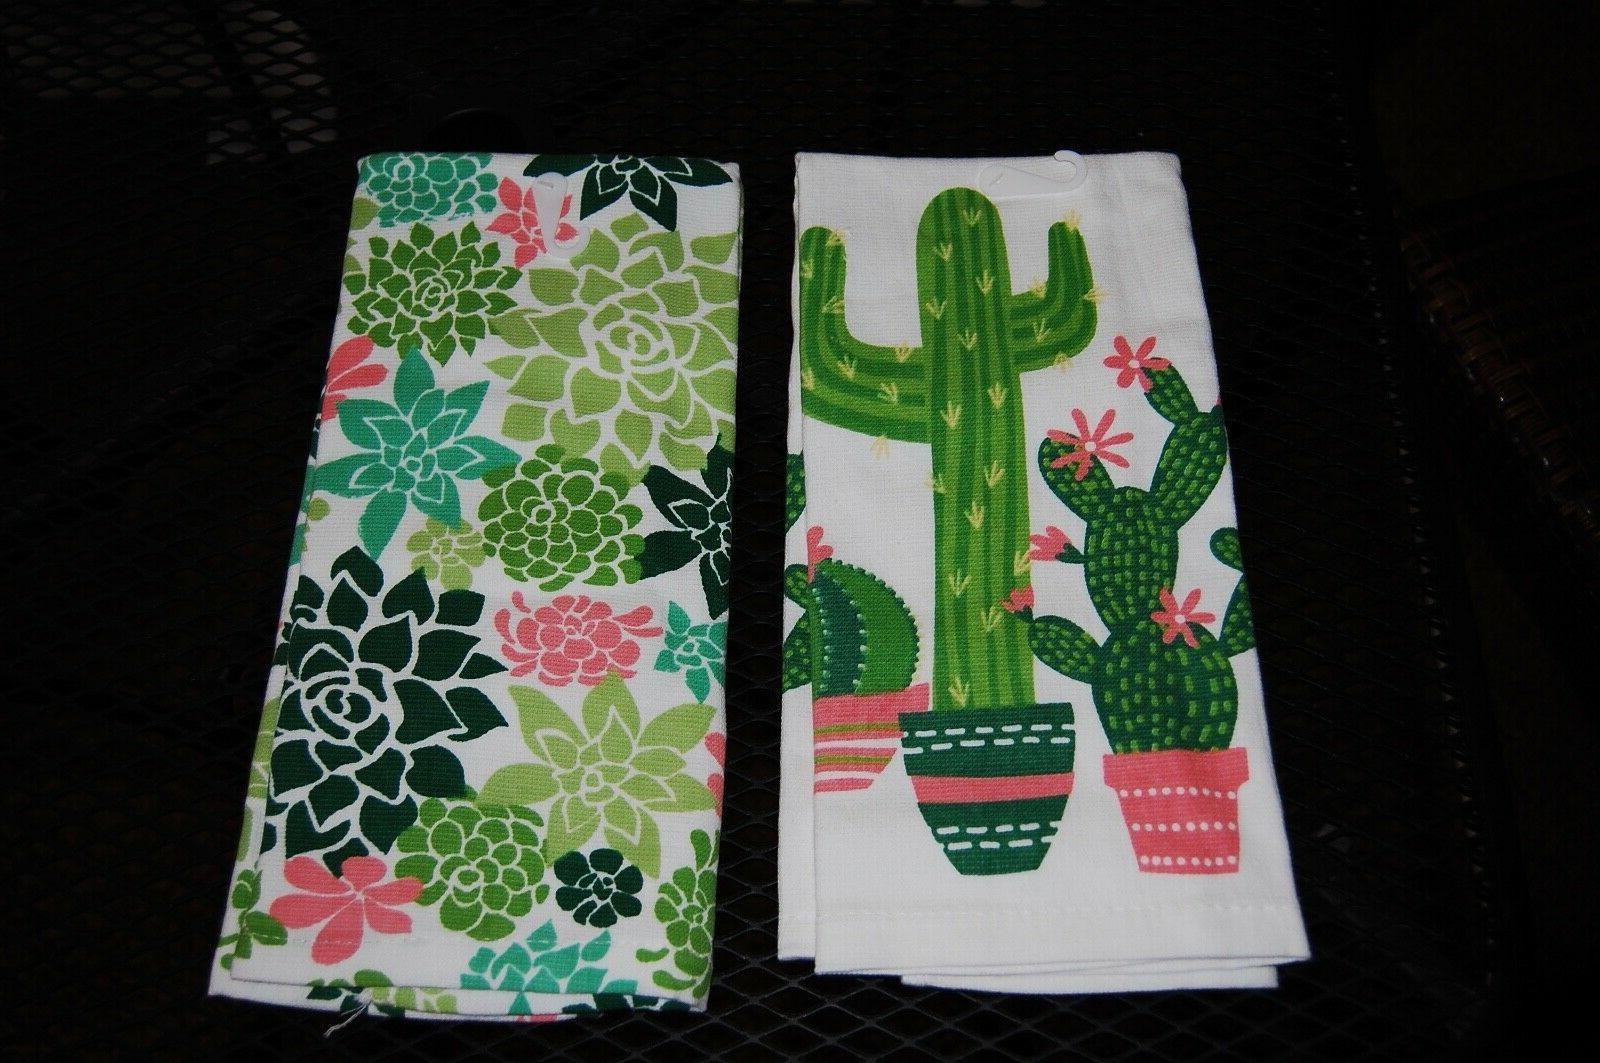 SET OF 2 TOWELS, CACTUS & FLOWERS. 100%